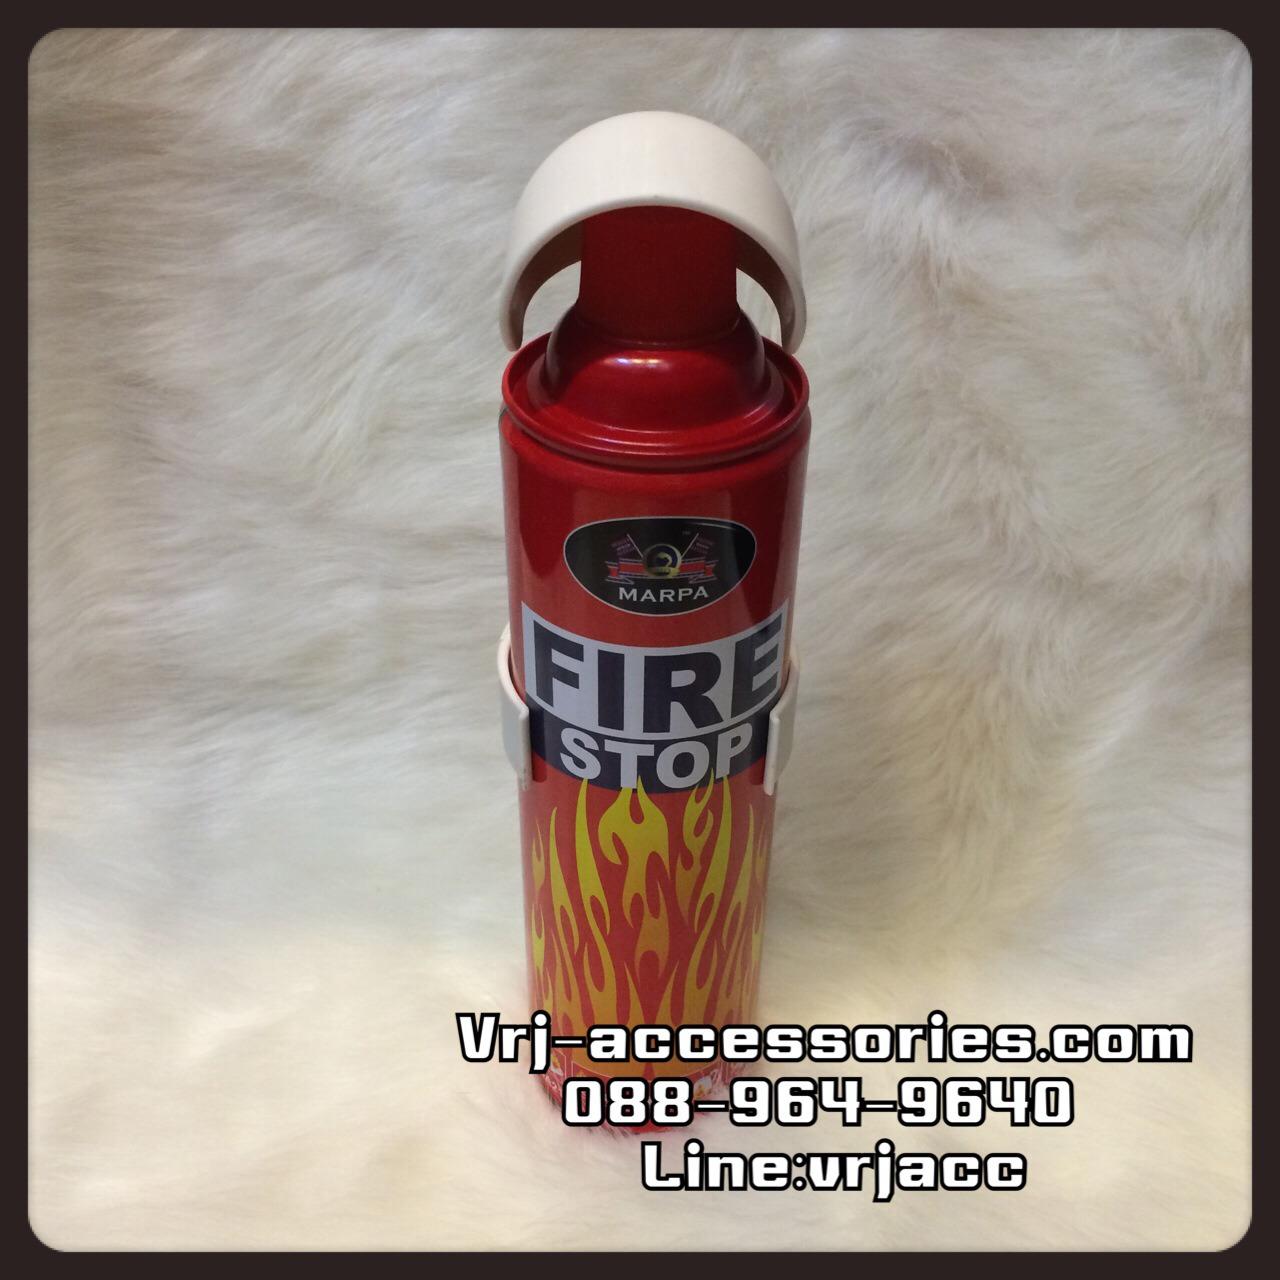 Vj1054 ถังดับเพลิงสำหรับรถยนต์ ถังดับเพลิงขนาดพกพา กระป๋องสีแดง : Fire Extinguisher